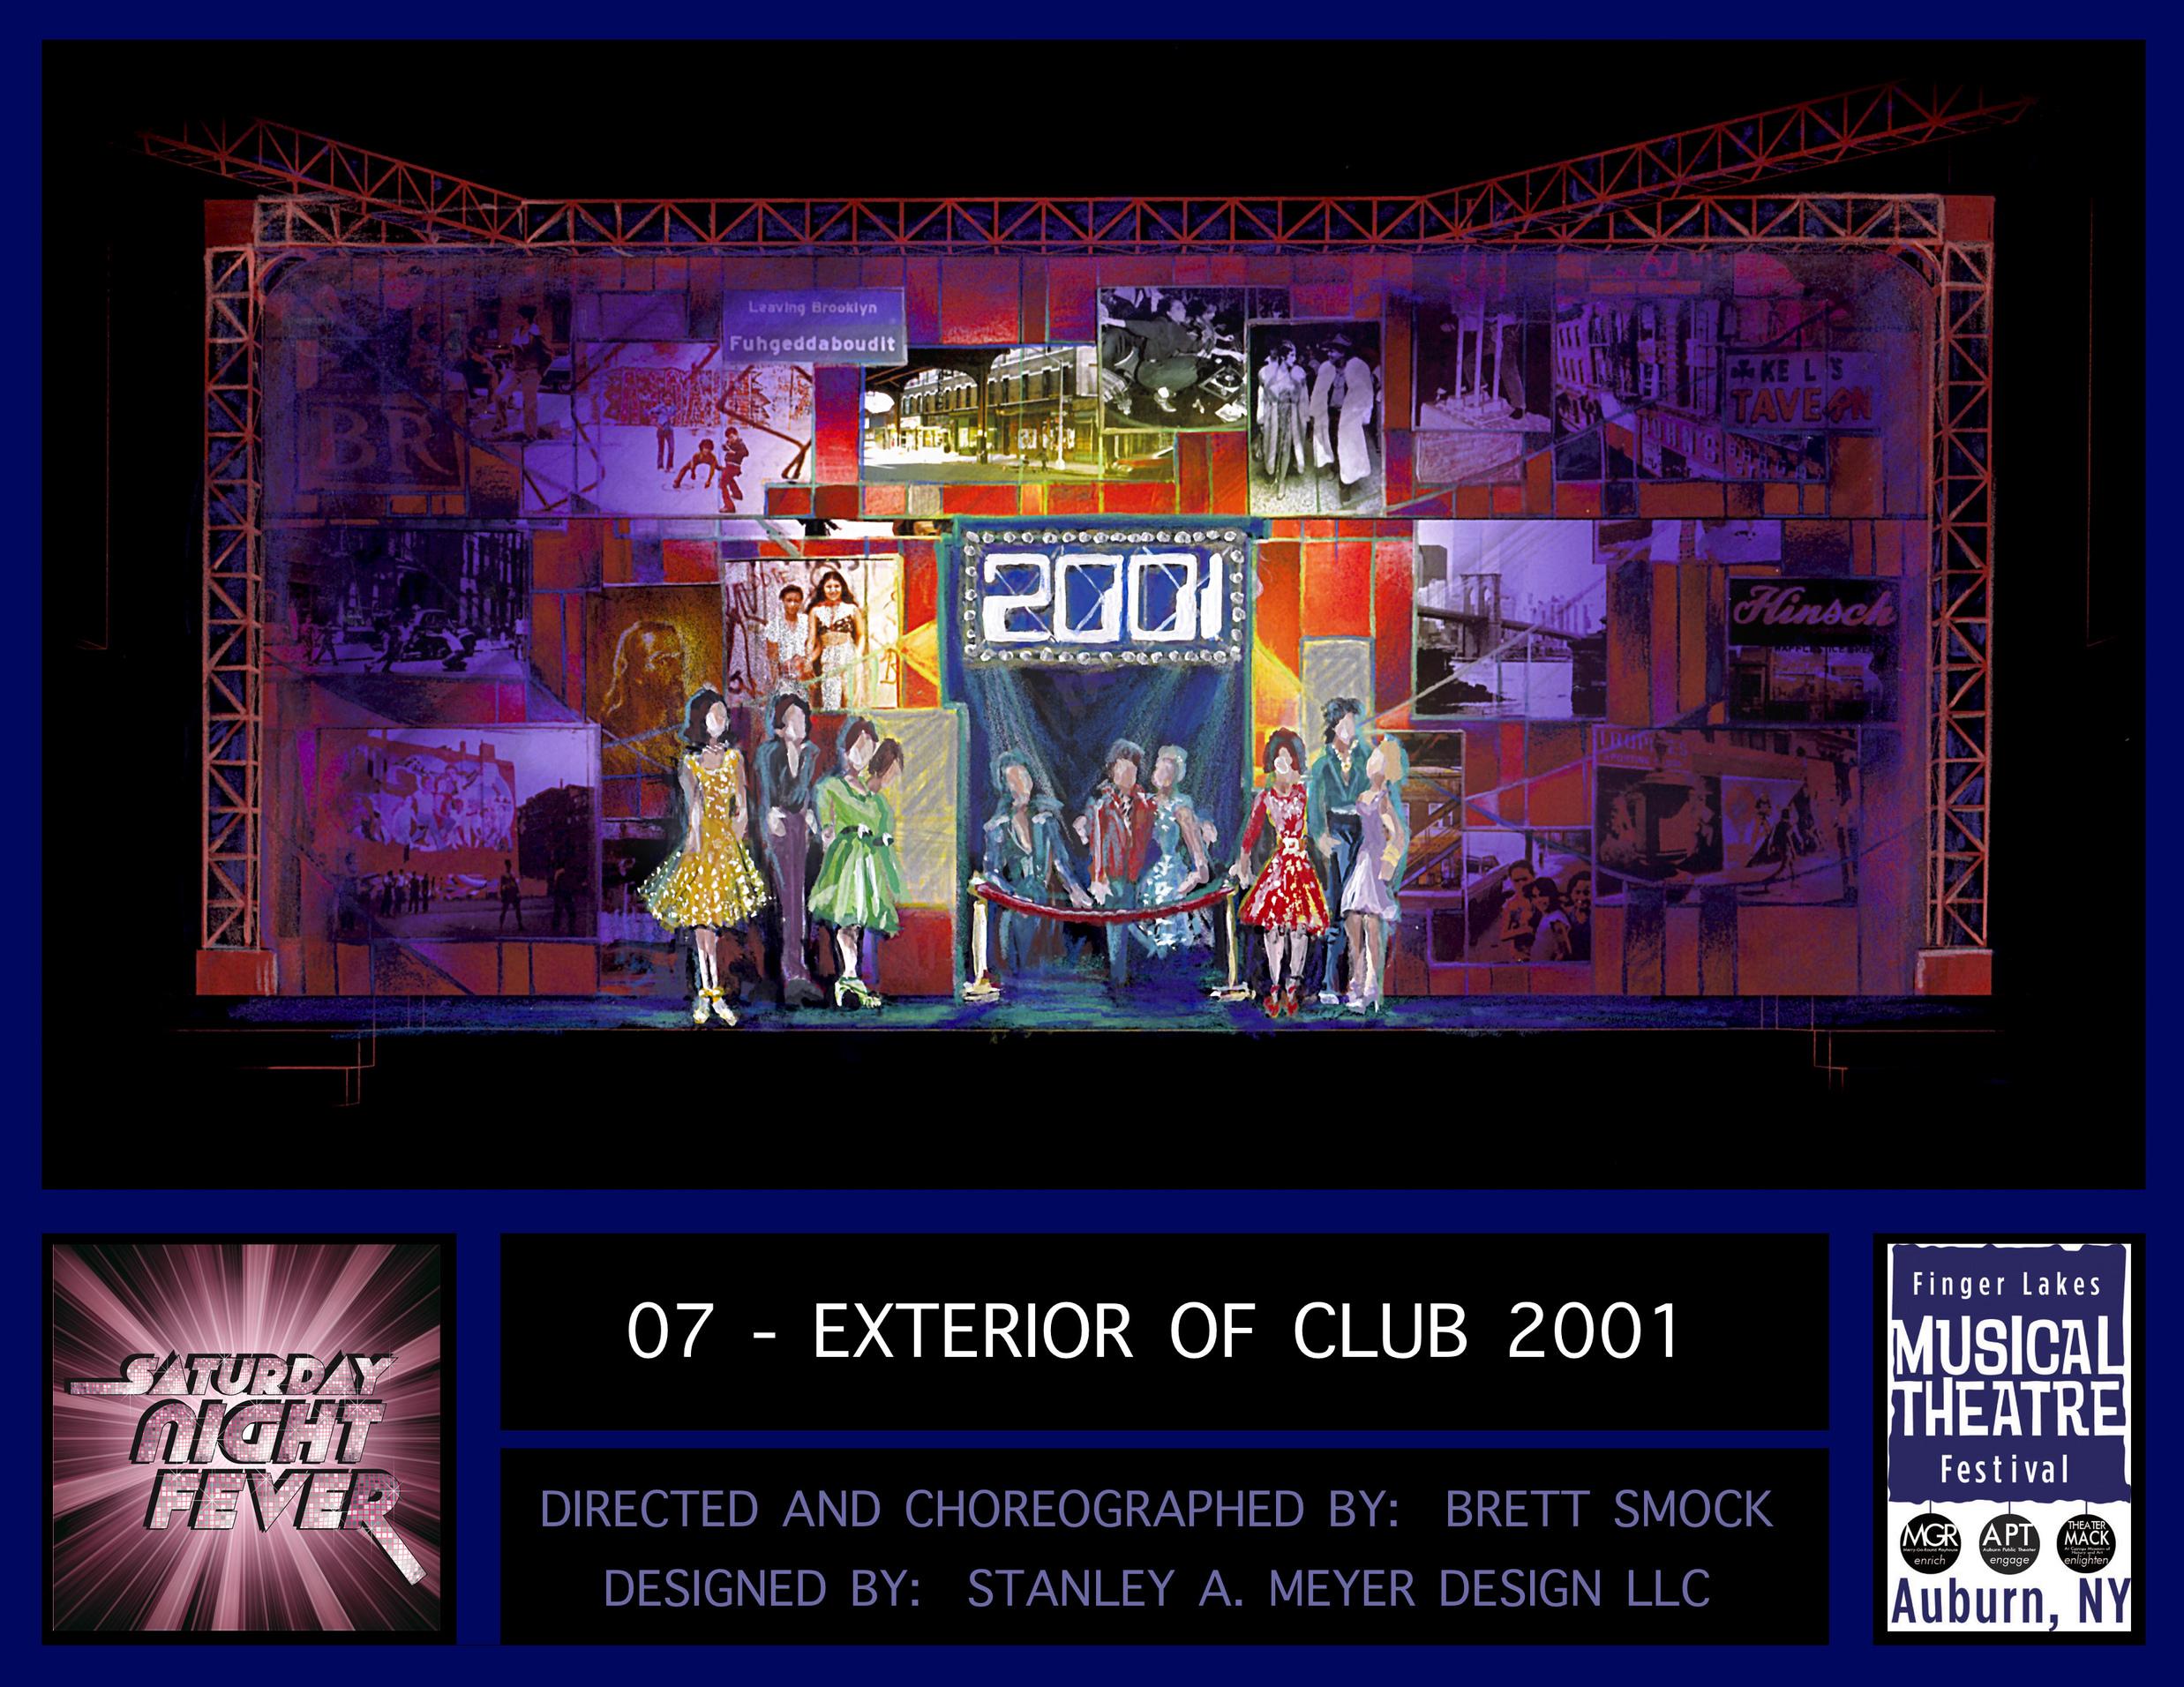 snf-07-exterior_of_club_2001.jpg